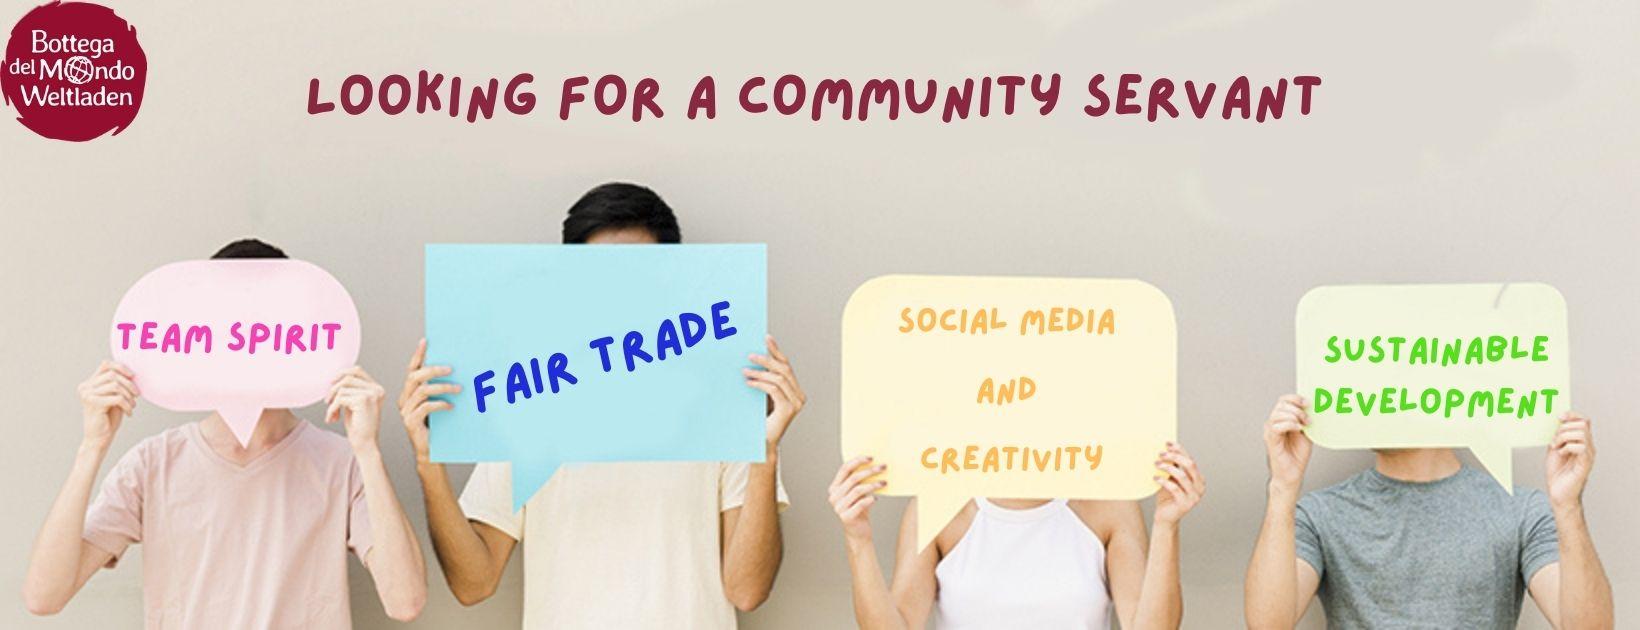 Community servant